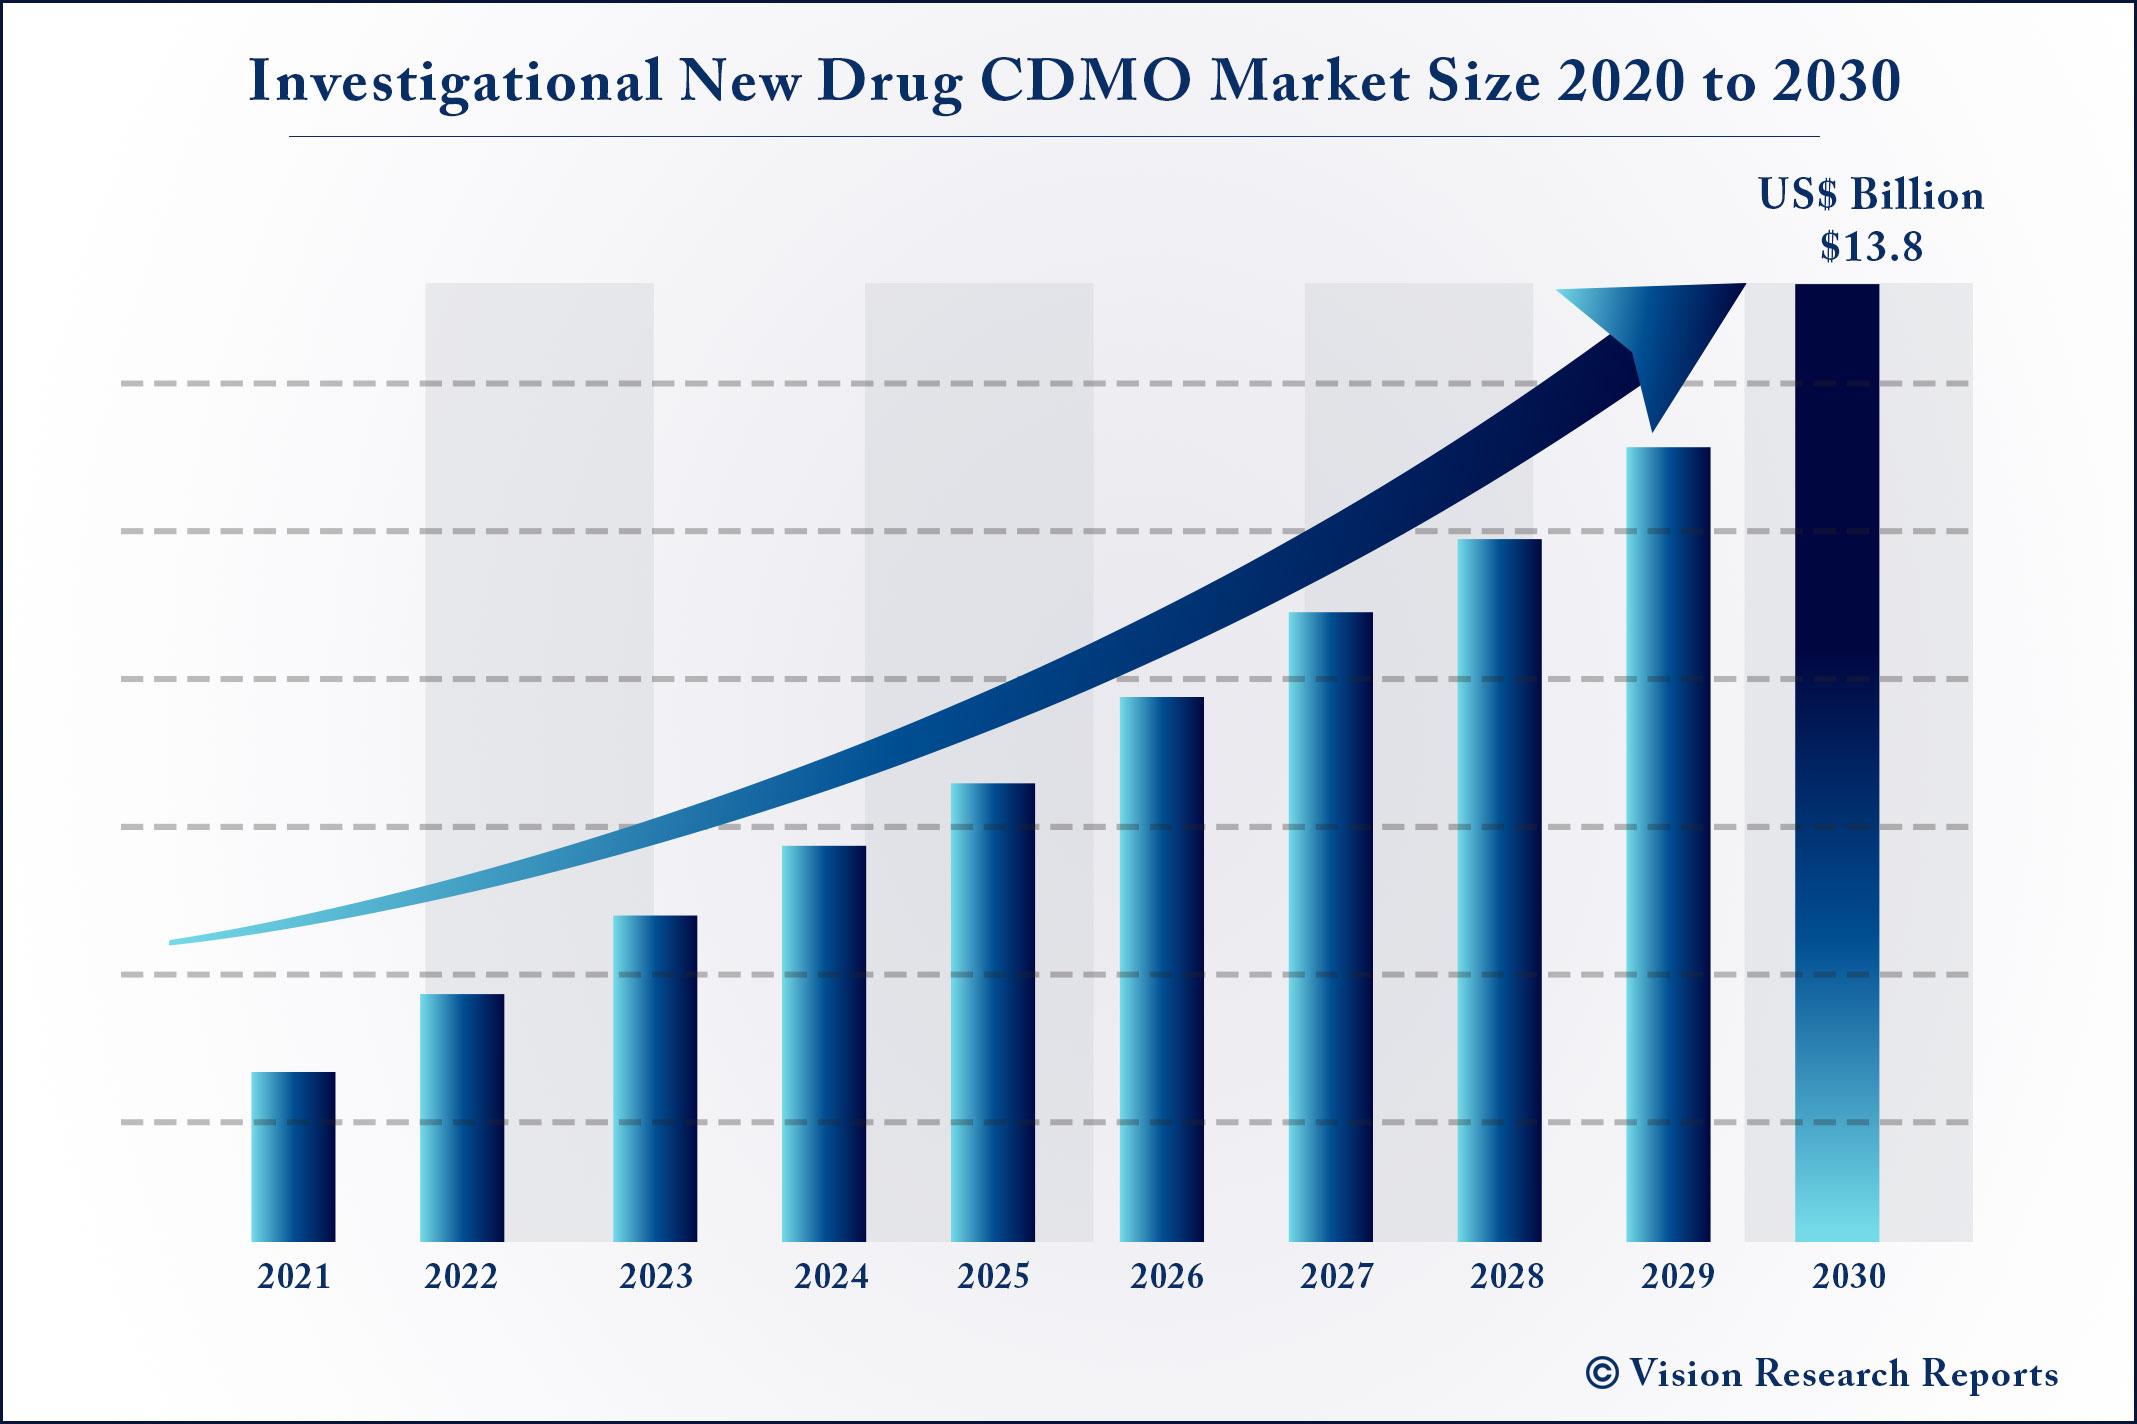 Investigational New Drug CDMO Market Size 2020 to 2030